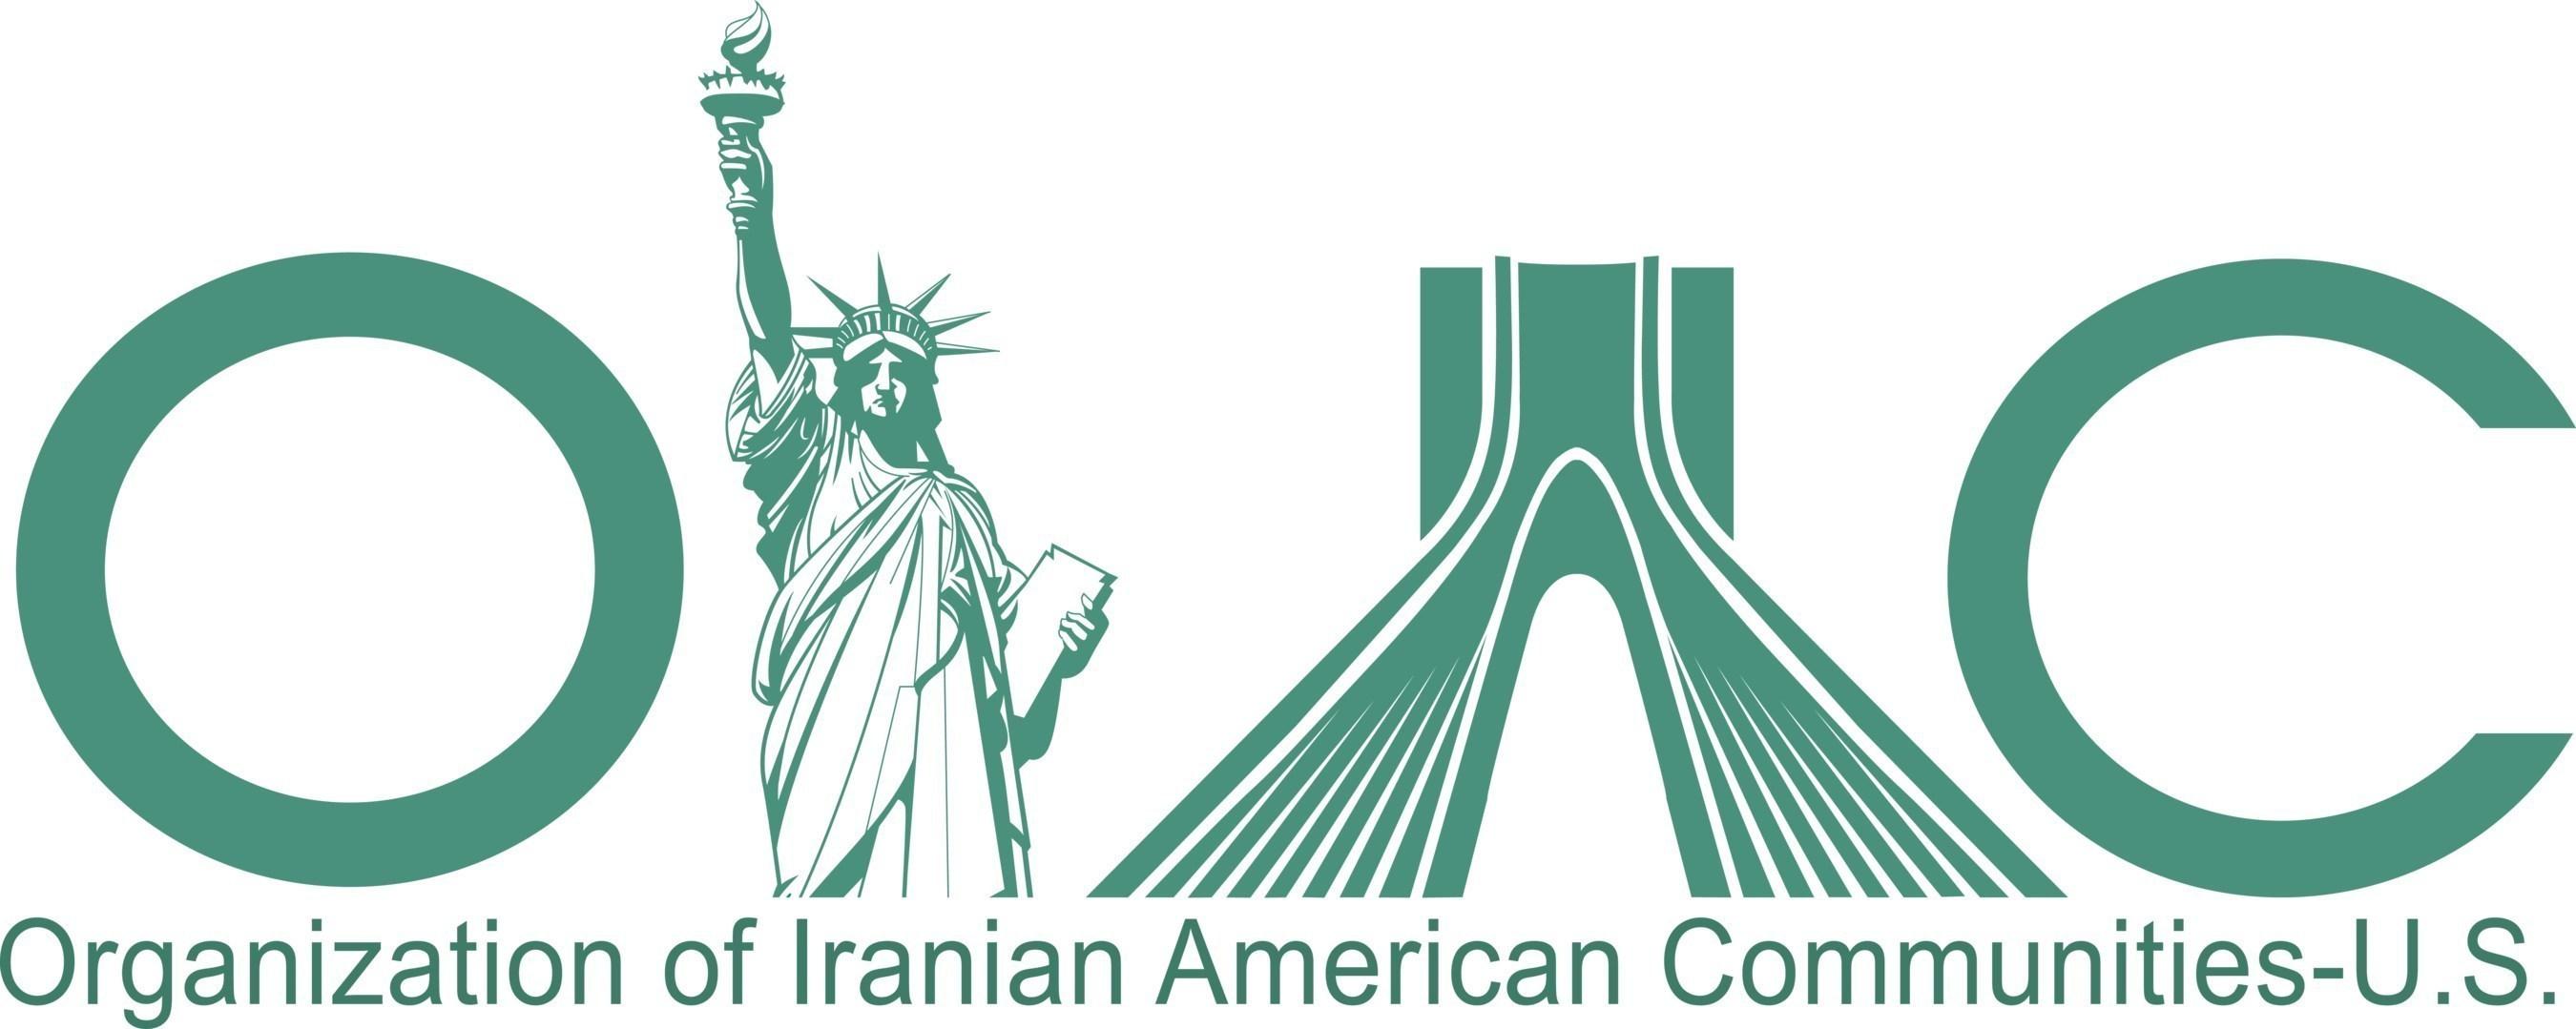 Organization of Iranian American Communities - U.S. (OIACUS)